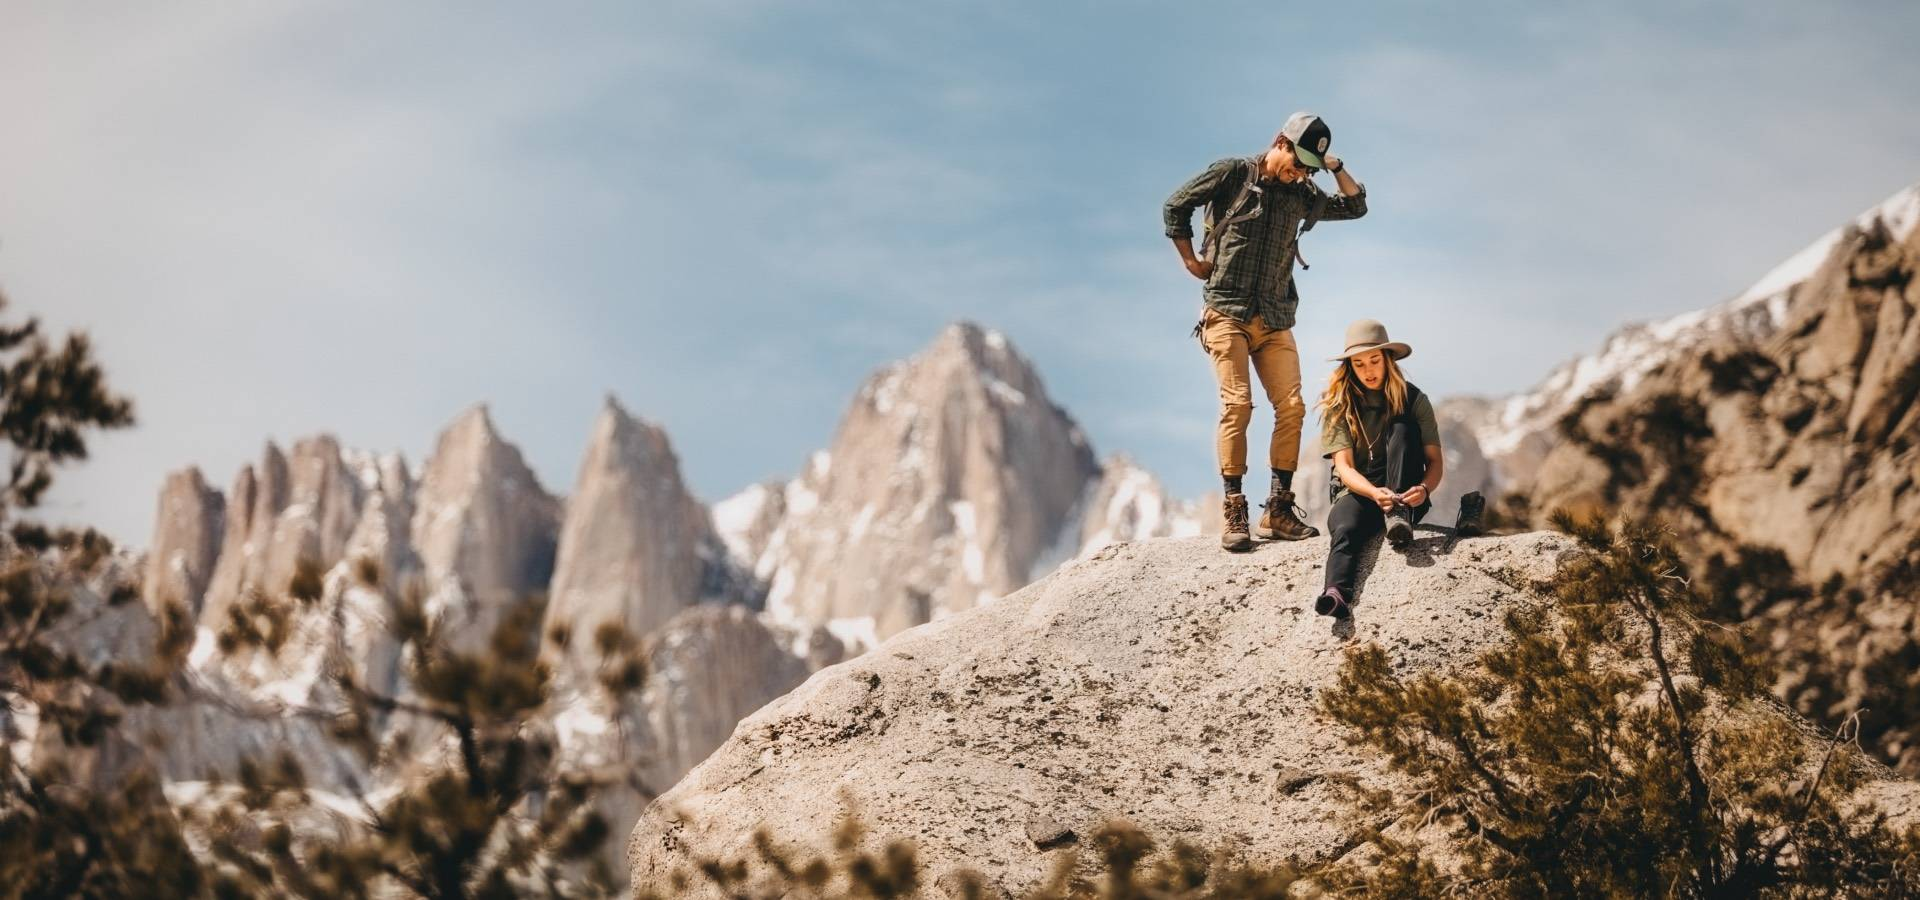 Two hikers on the summit wearing darn tough merino wool socks, the best socks for hiking